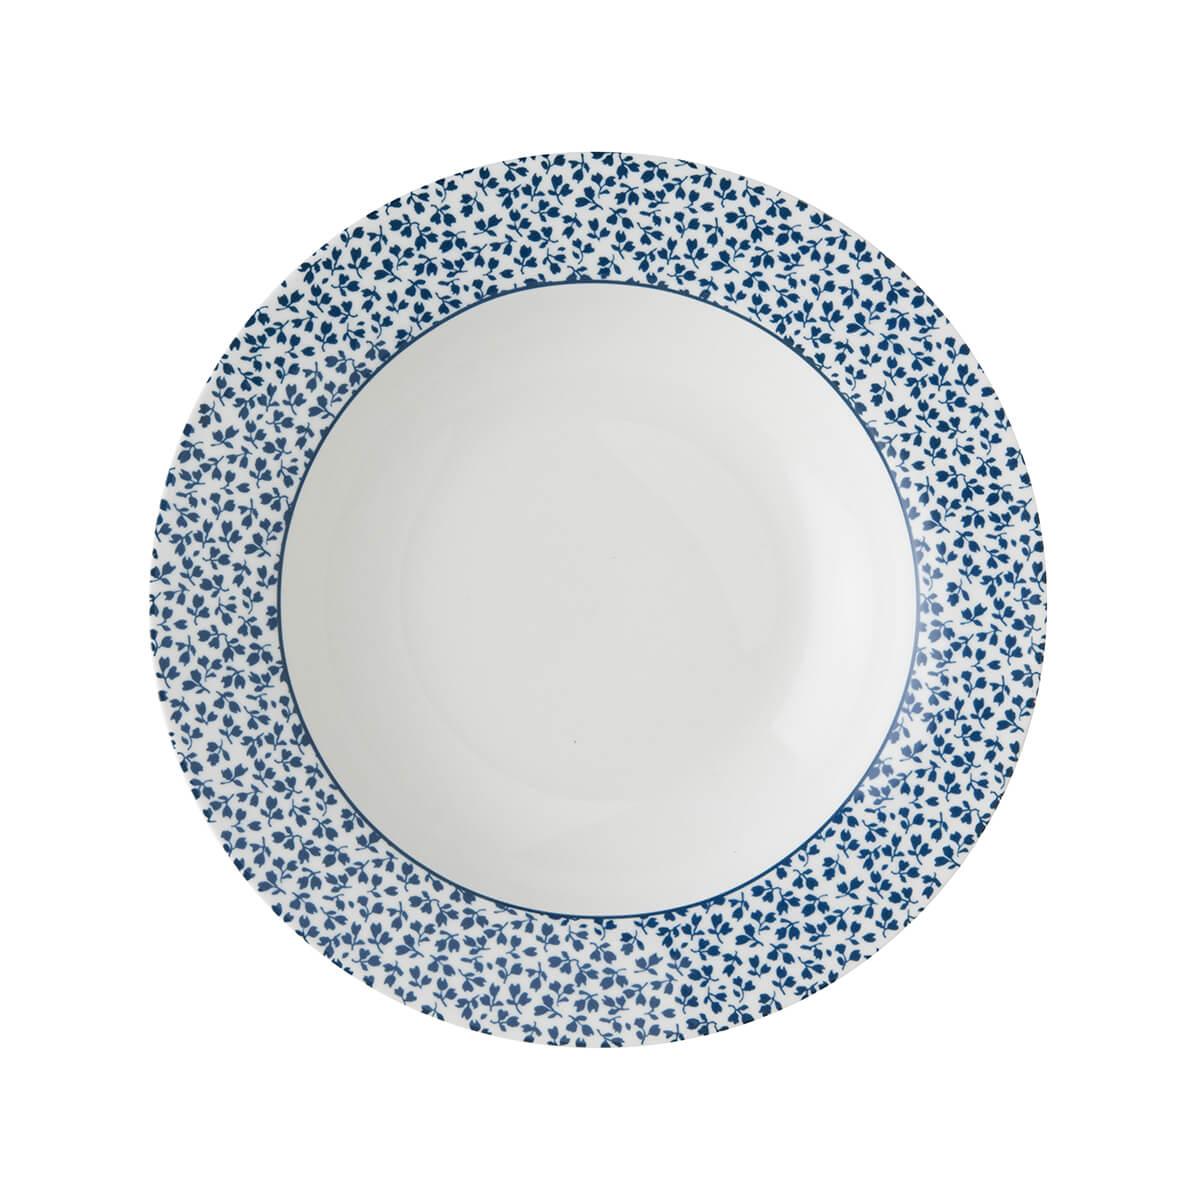 Онлайн каталог PROMENU: Тарелка глубокая фарфоровая Laura Ashley BLUEPRINT, 22 см, белый в синий мелкий цветок                               178269